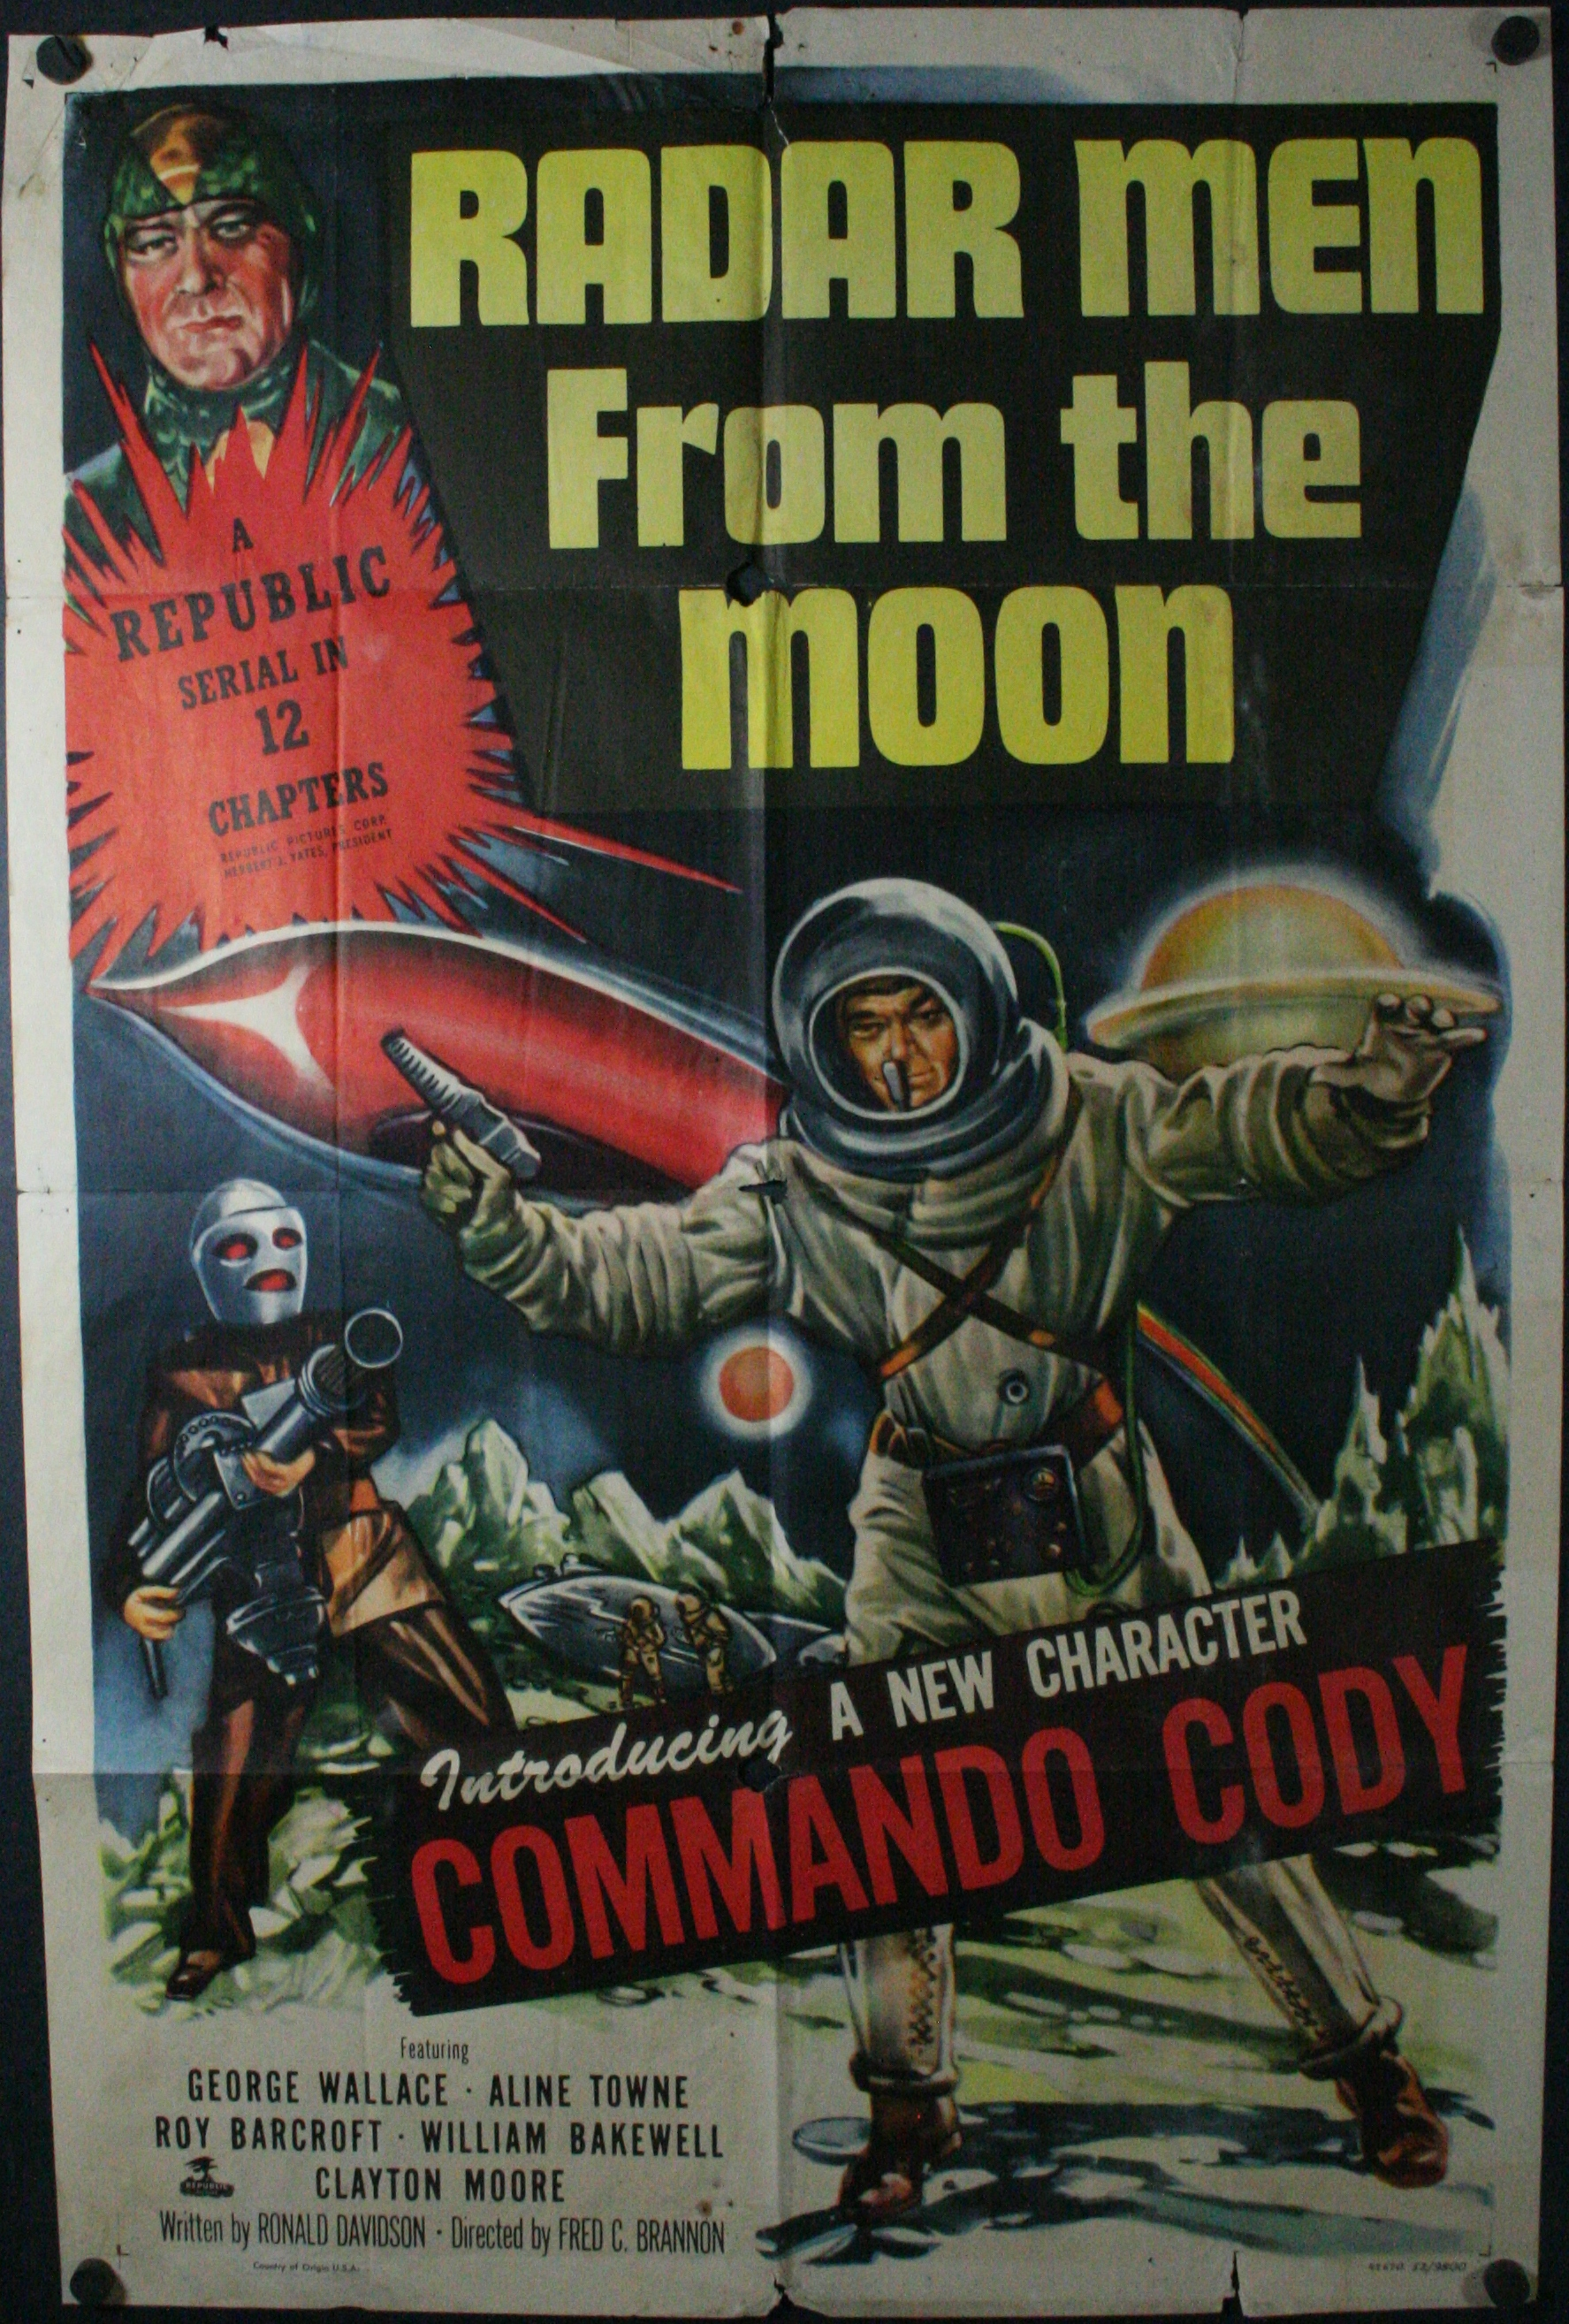 The moon original commando cody serial sci fi movie theater poster